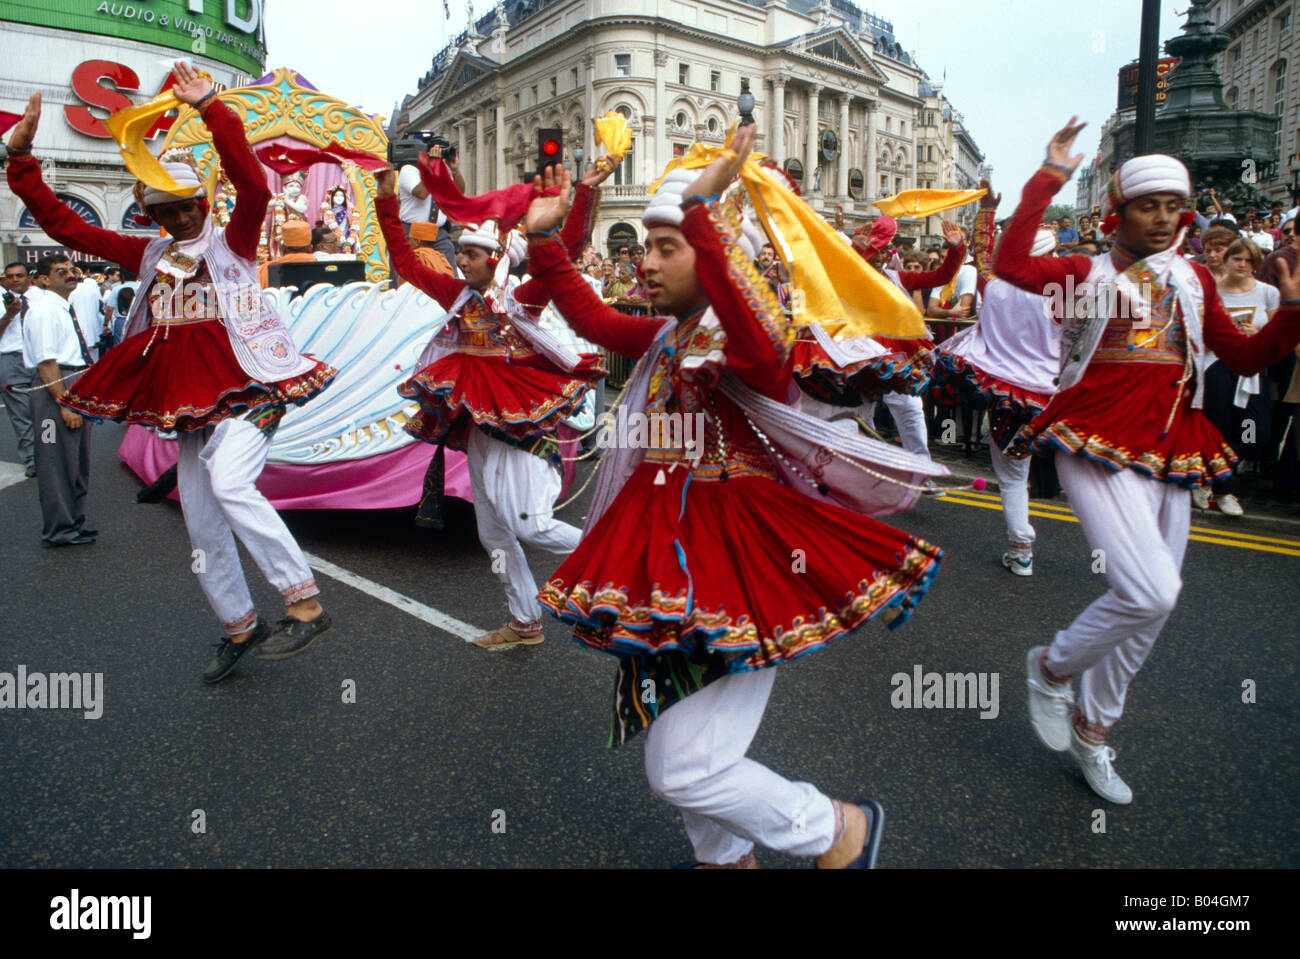 Hindu Parade London  People Dancing - Stock Image